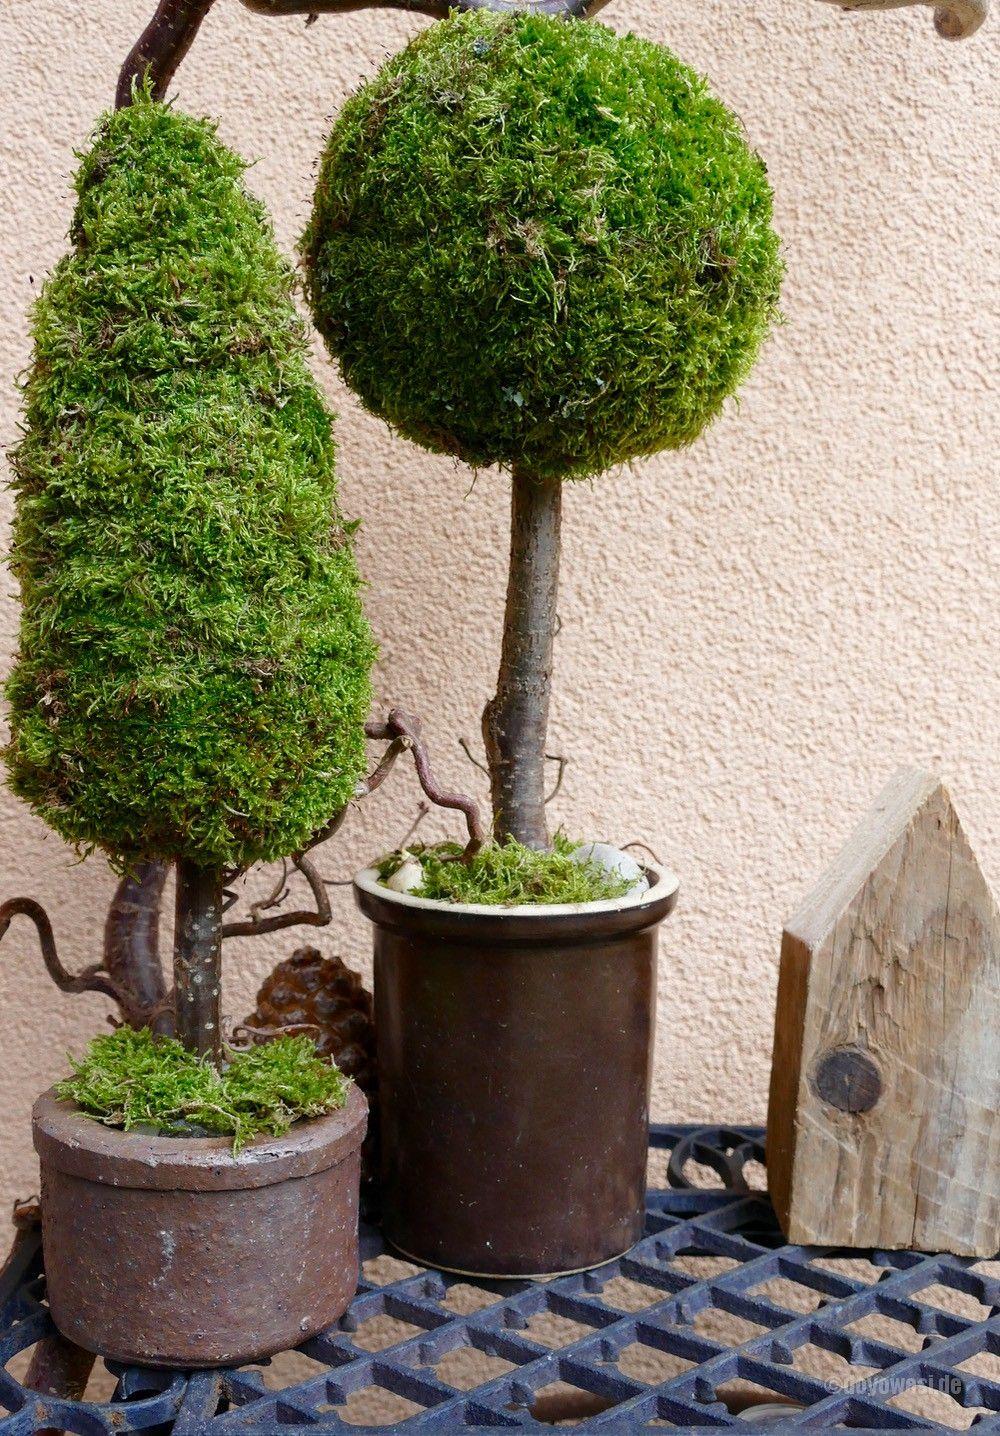 Bäume aus Moos - DIY #herbstdekoeingangsbereich